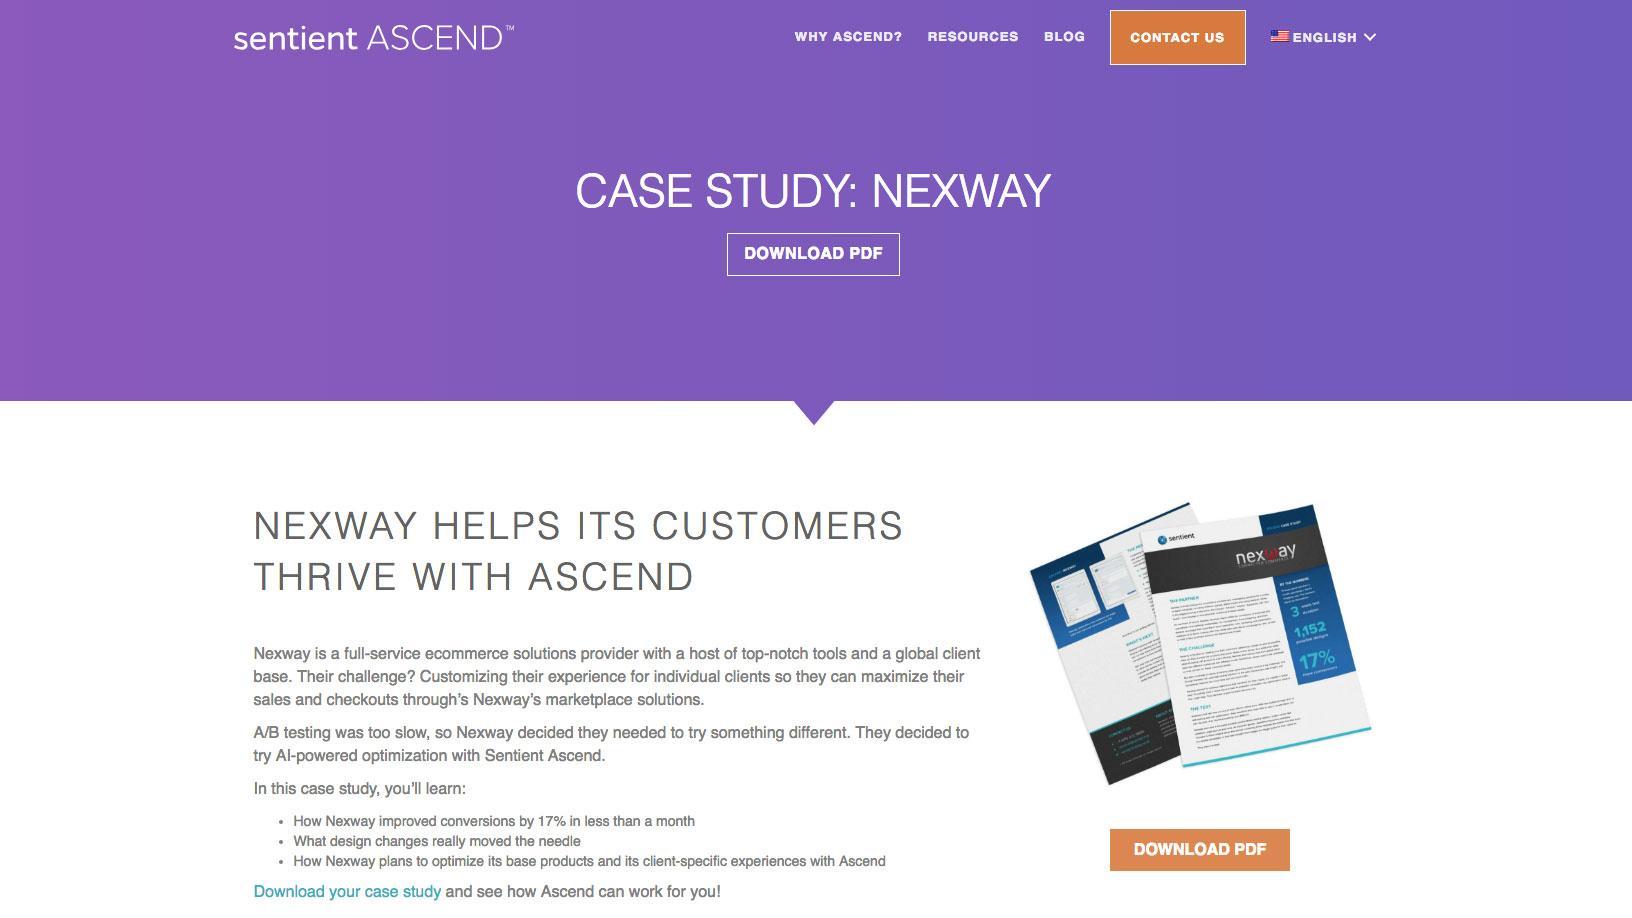 Nexway case study landing page